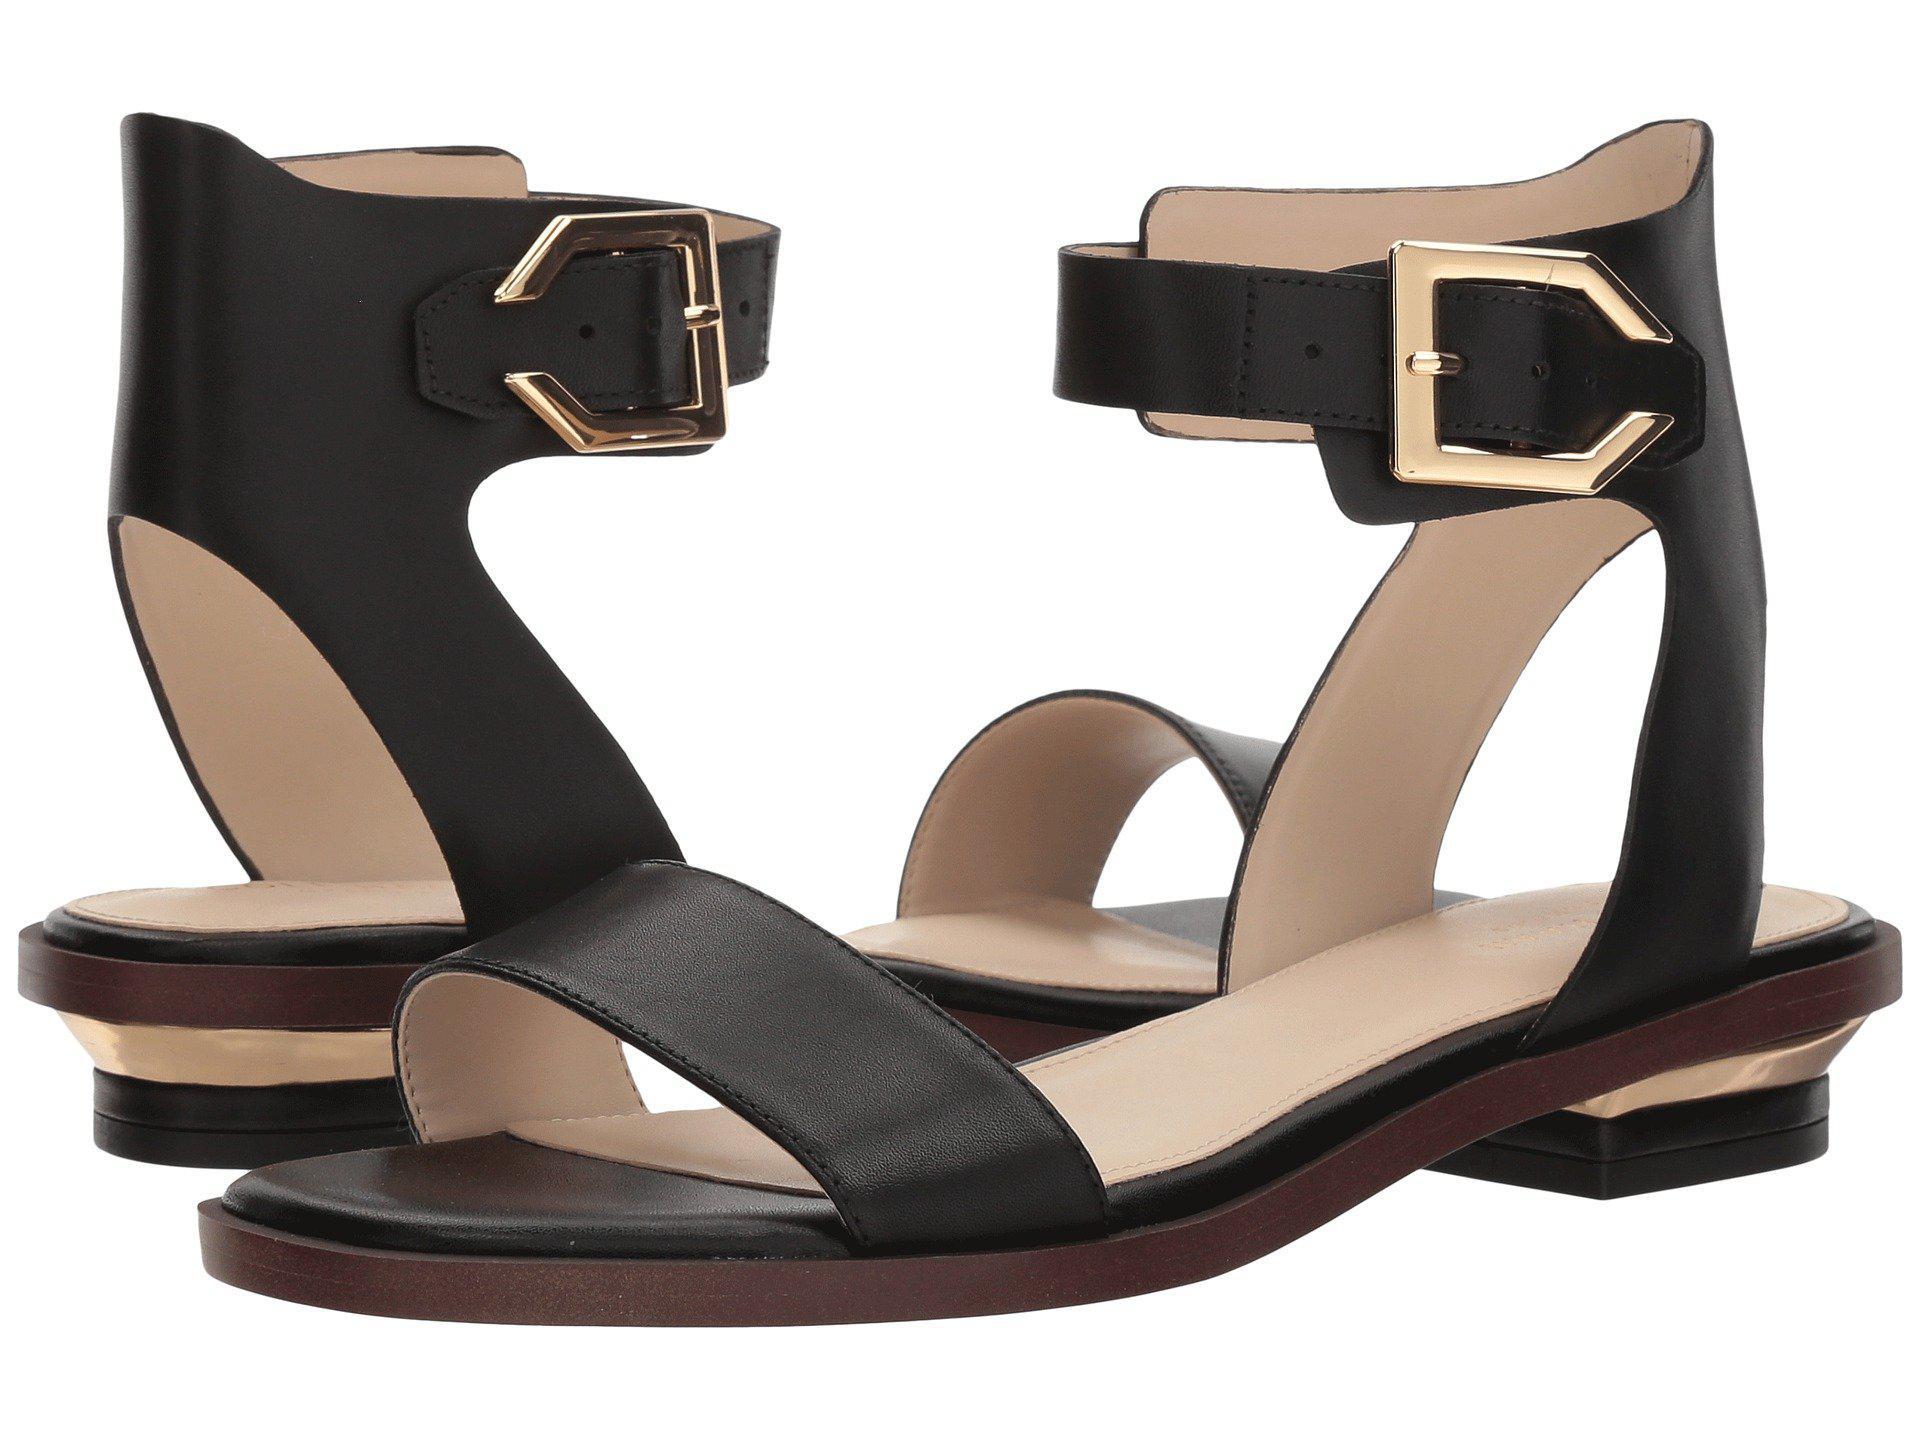 484547e3ba7 Lyst - Cole Haan Avani Sandal in Black - Save 14%